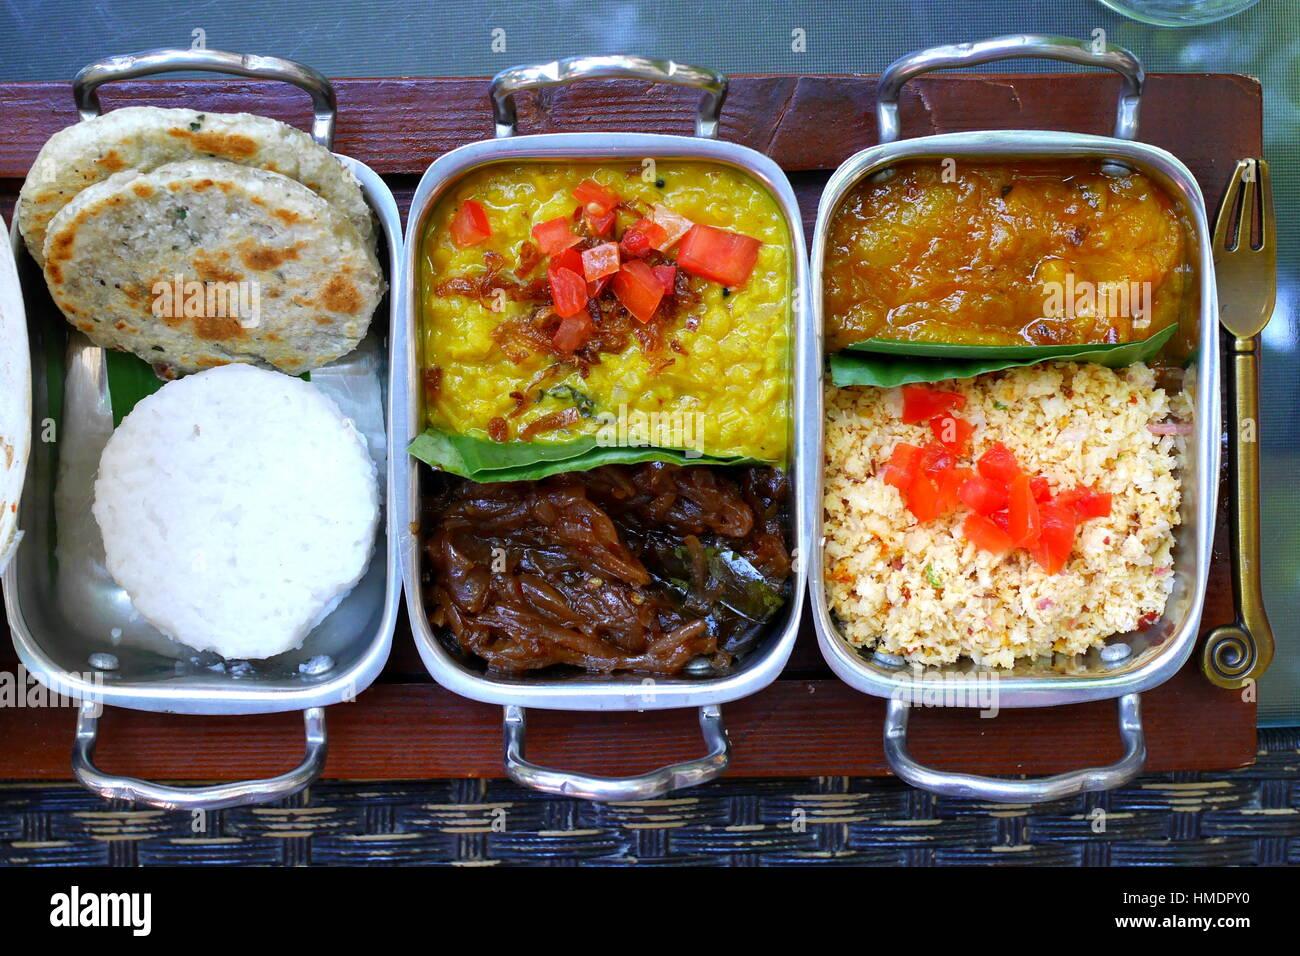 Sri Lankan breakfast, Adliya, Bahrain - Stock Image